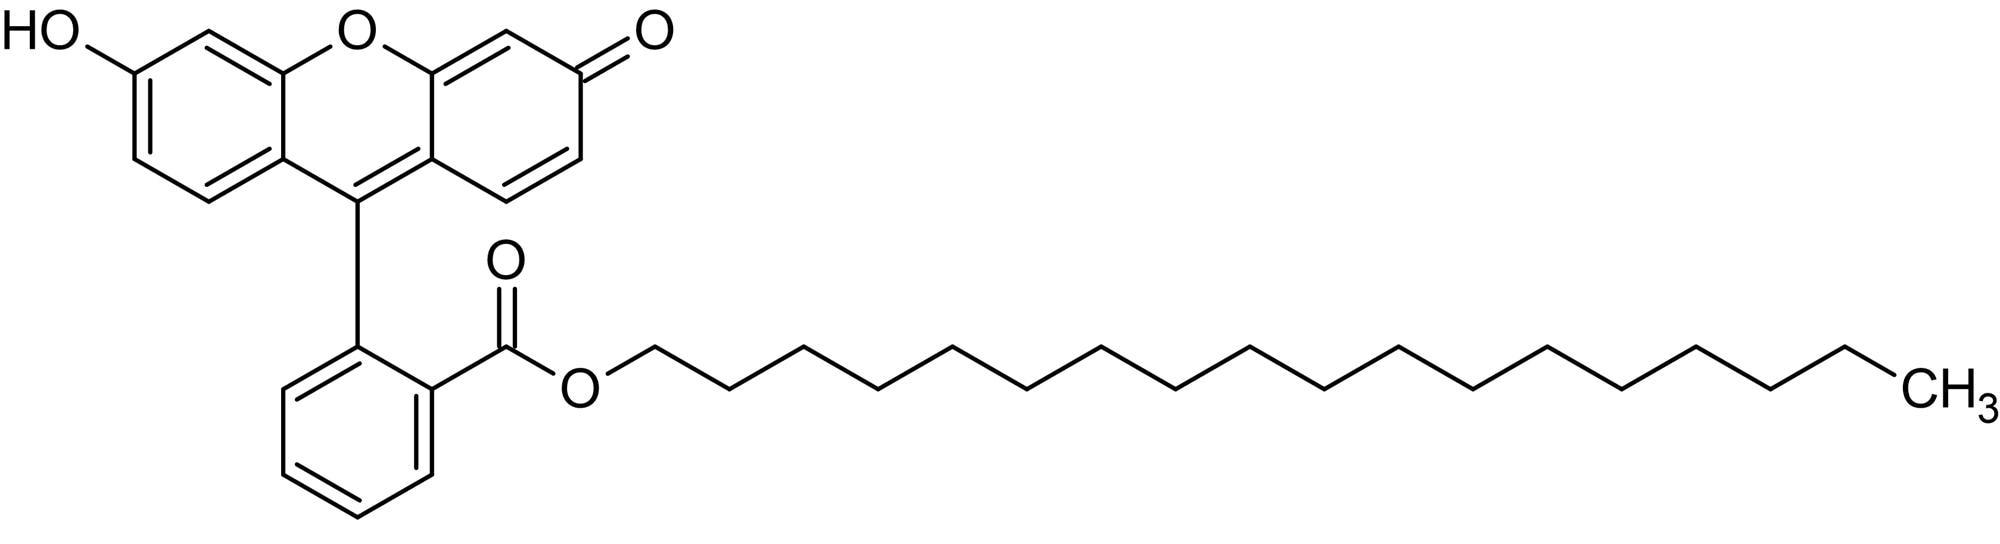 Chemical Structure - Fluorescein octadecyl ester, Lipophilic fluorescent pH indicator (ab145431)